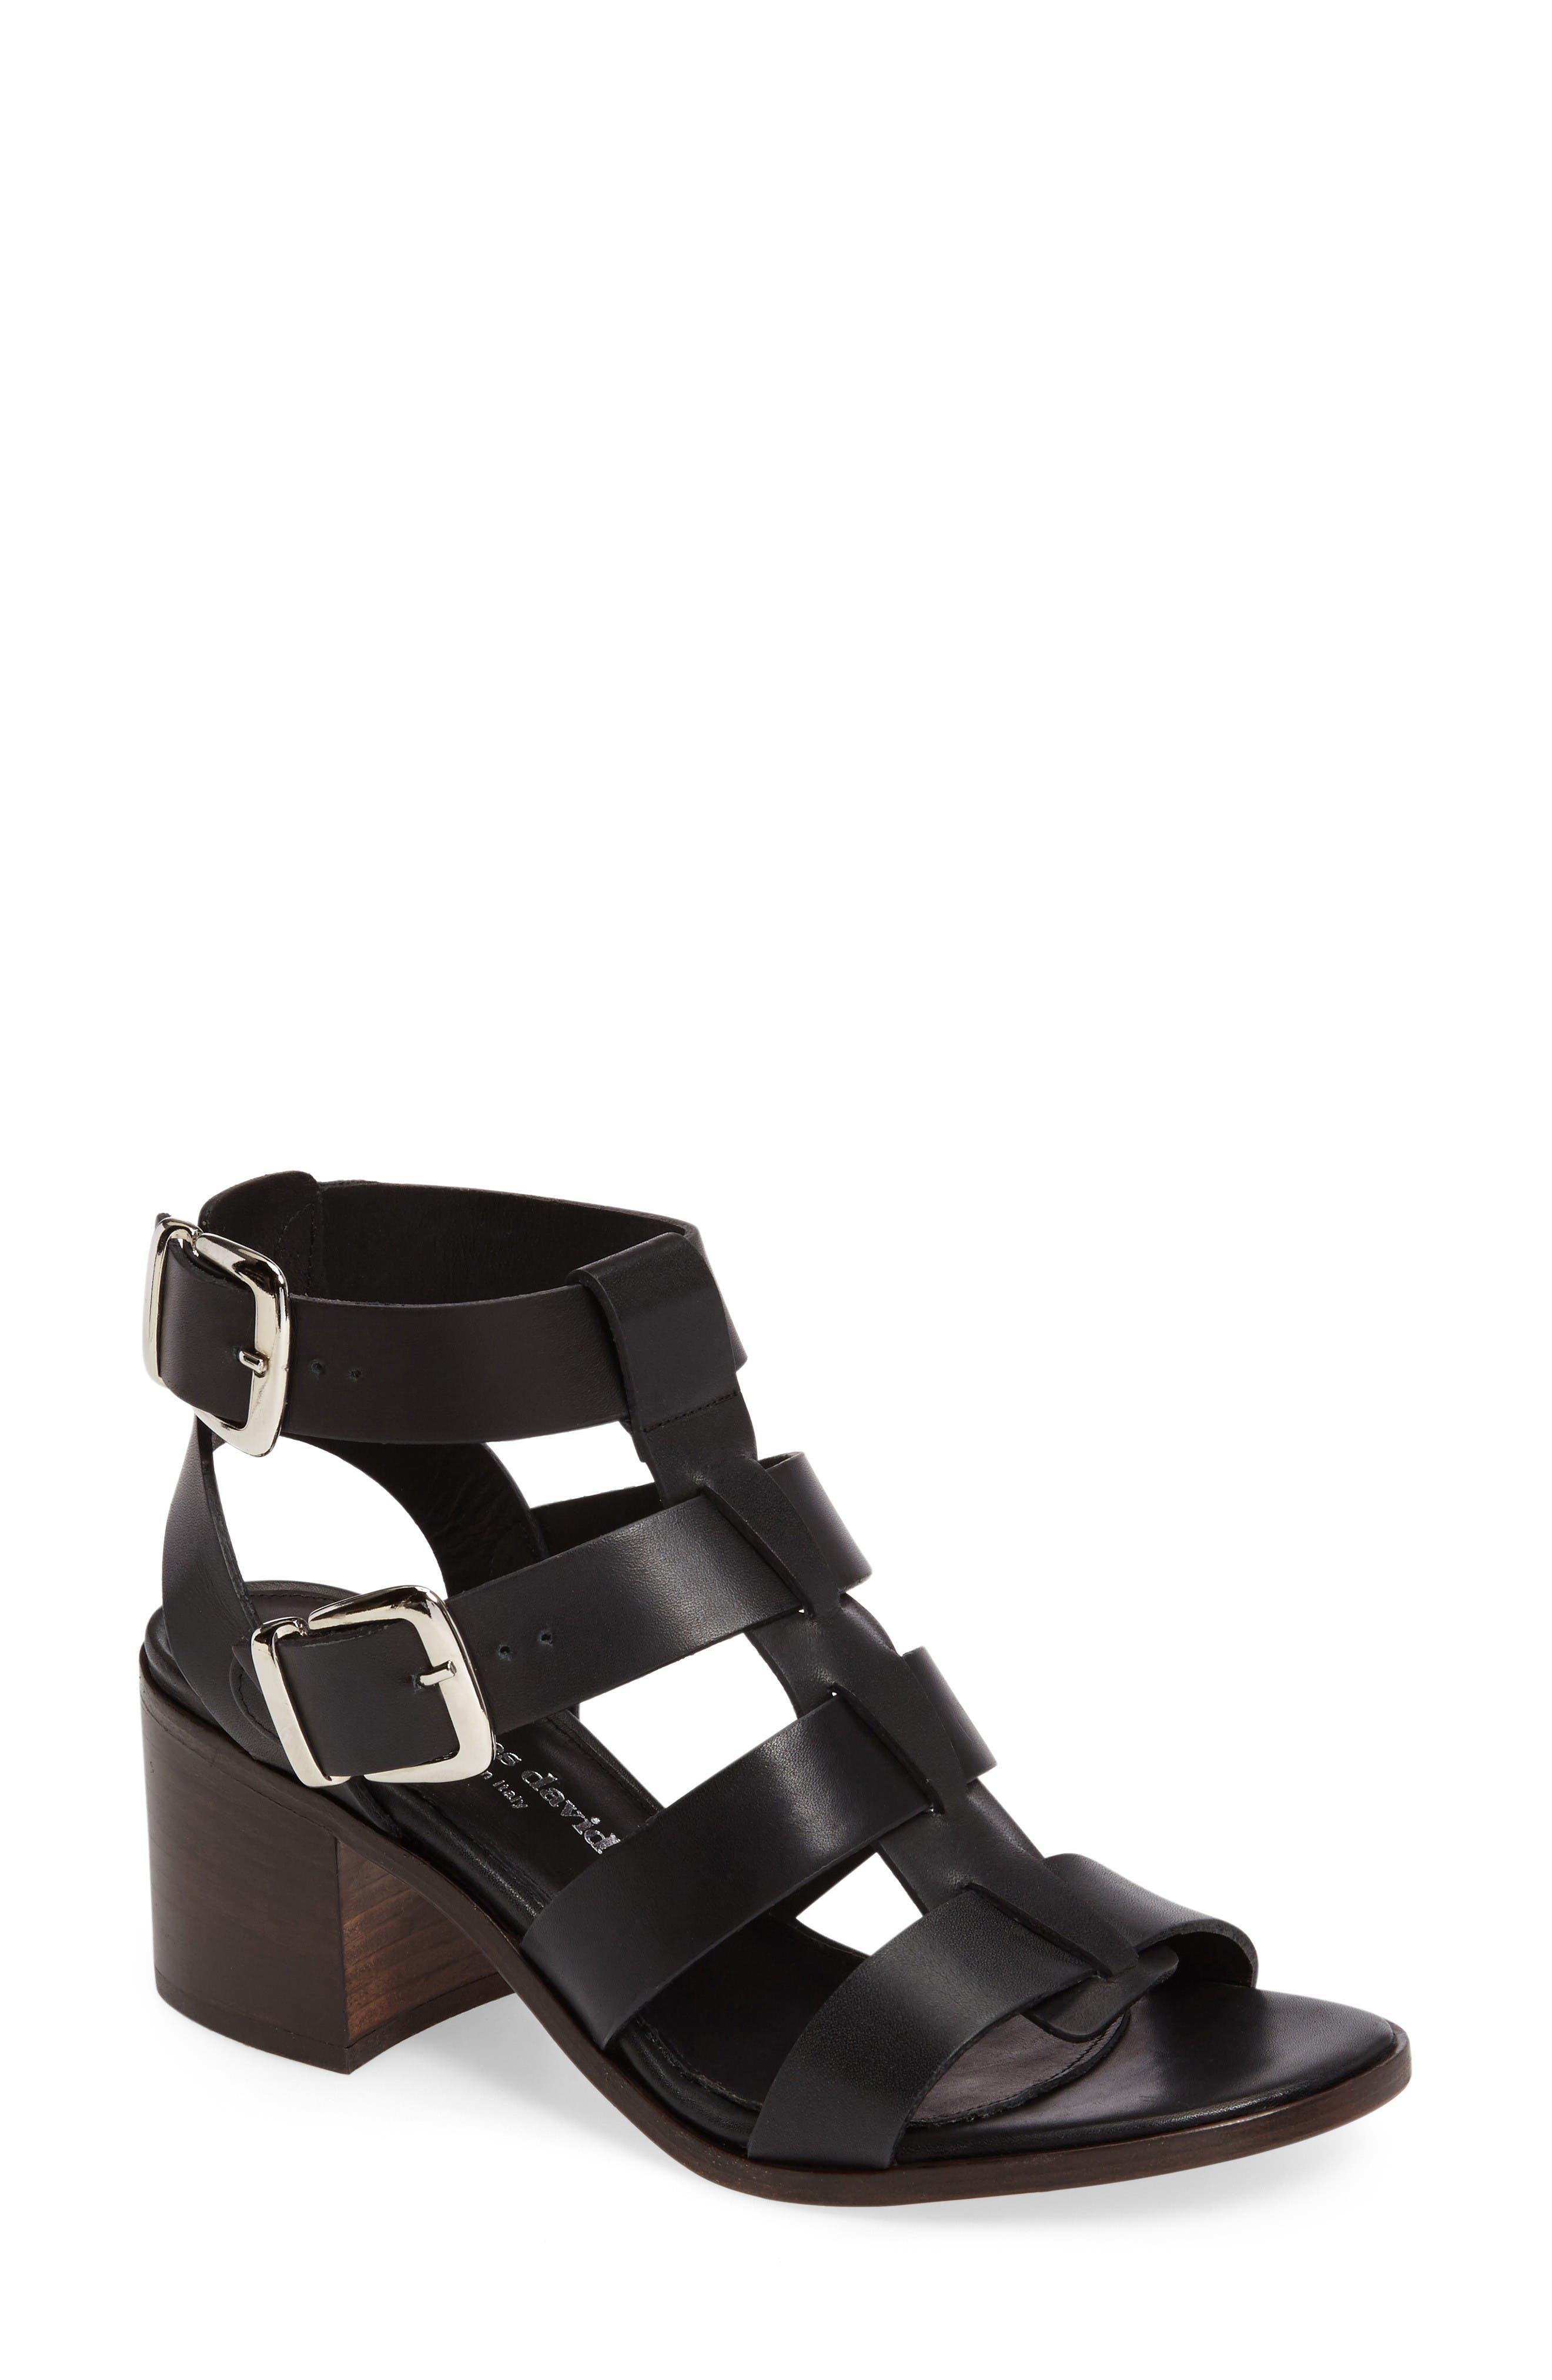 Main Image - Charles David Bronson Block Heel Sandal (Women)